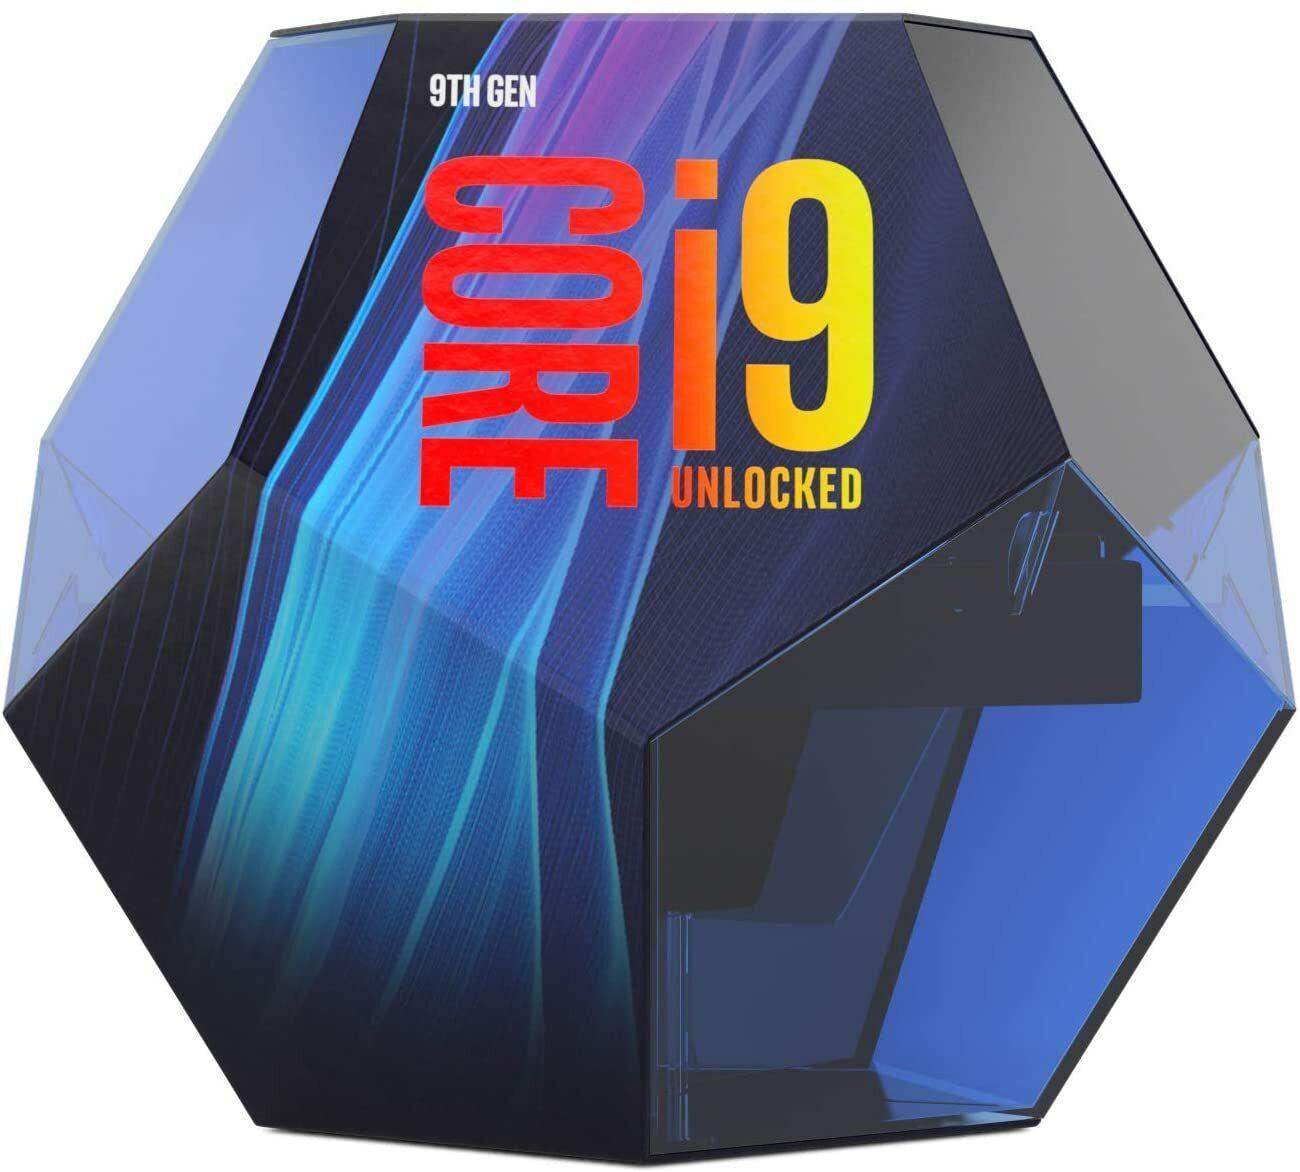 Intel Core i9-9900K Desktop Processor 8 Cores up to 5.0 GHz Turbo Unlocked 1151